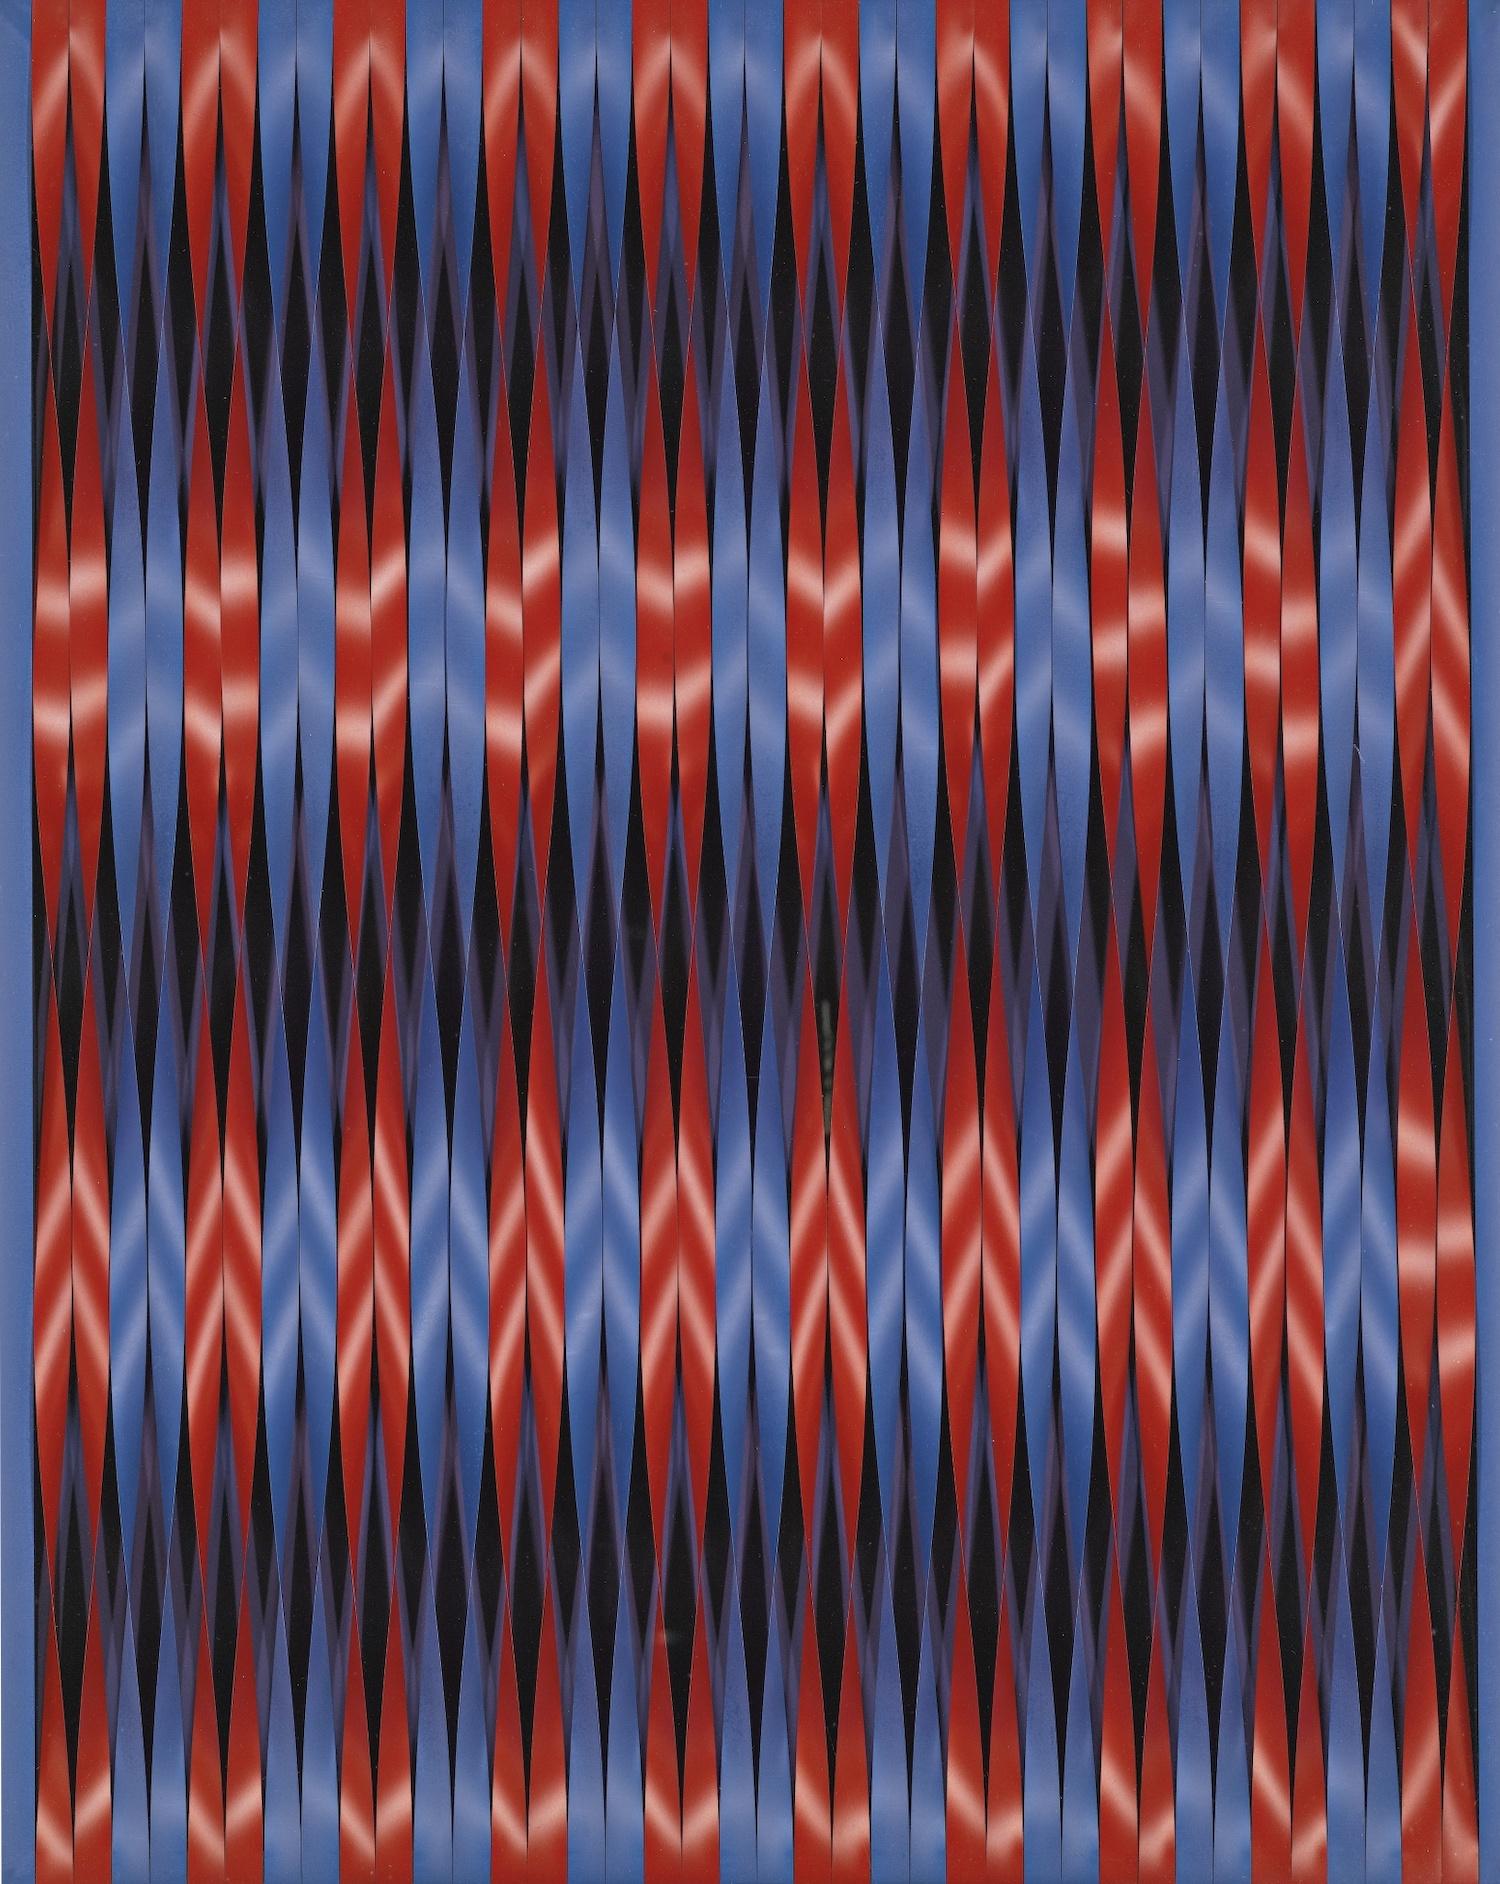 Walter Leblanc, Twisted Strings 1964